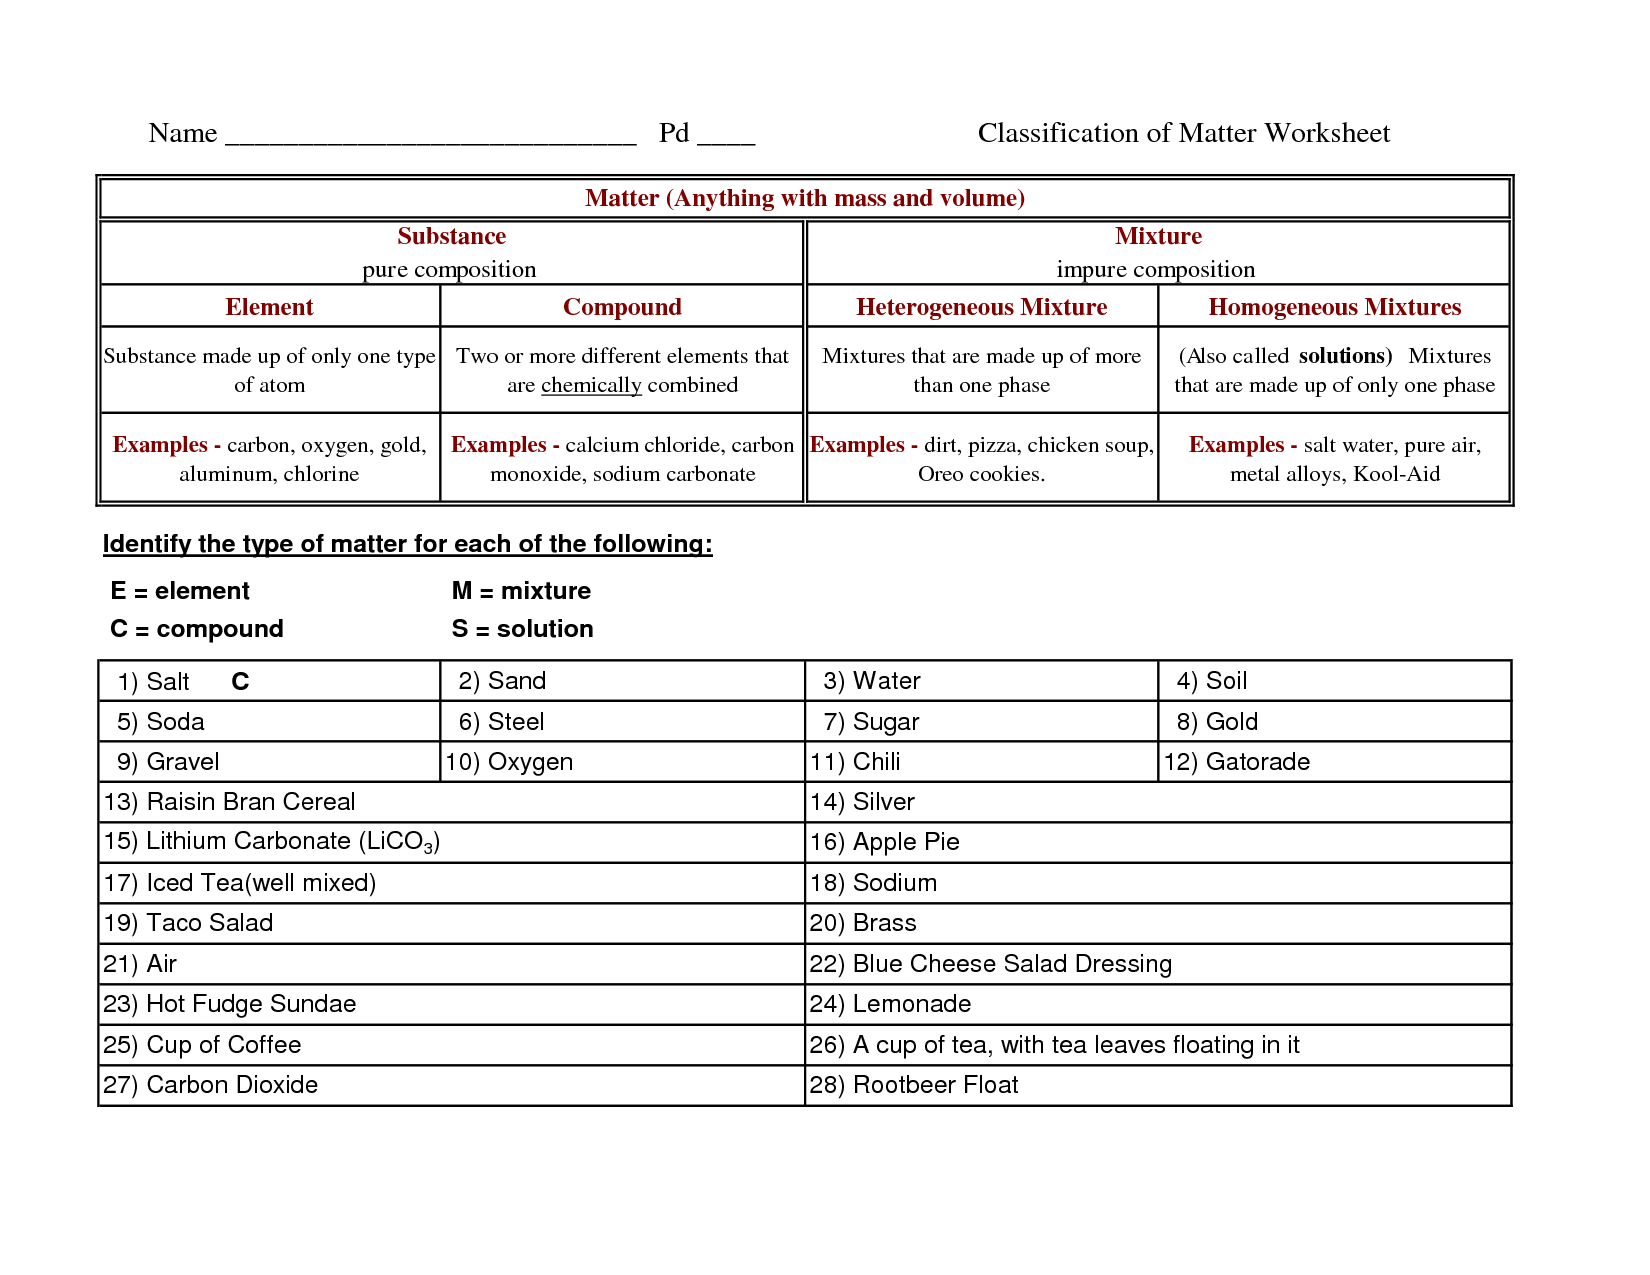 {Classification of Matter Worksheet Docstoc Google Search – Worksheet Classification of Matter